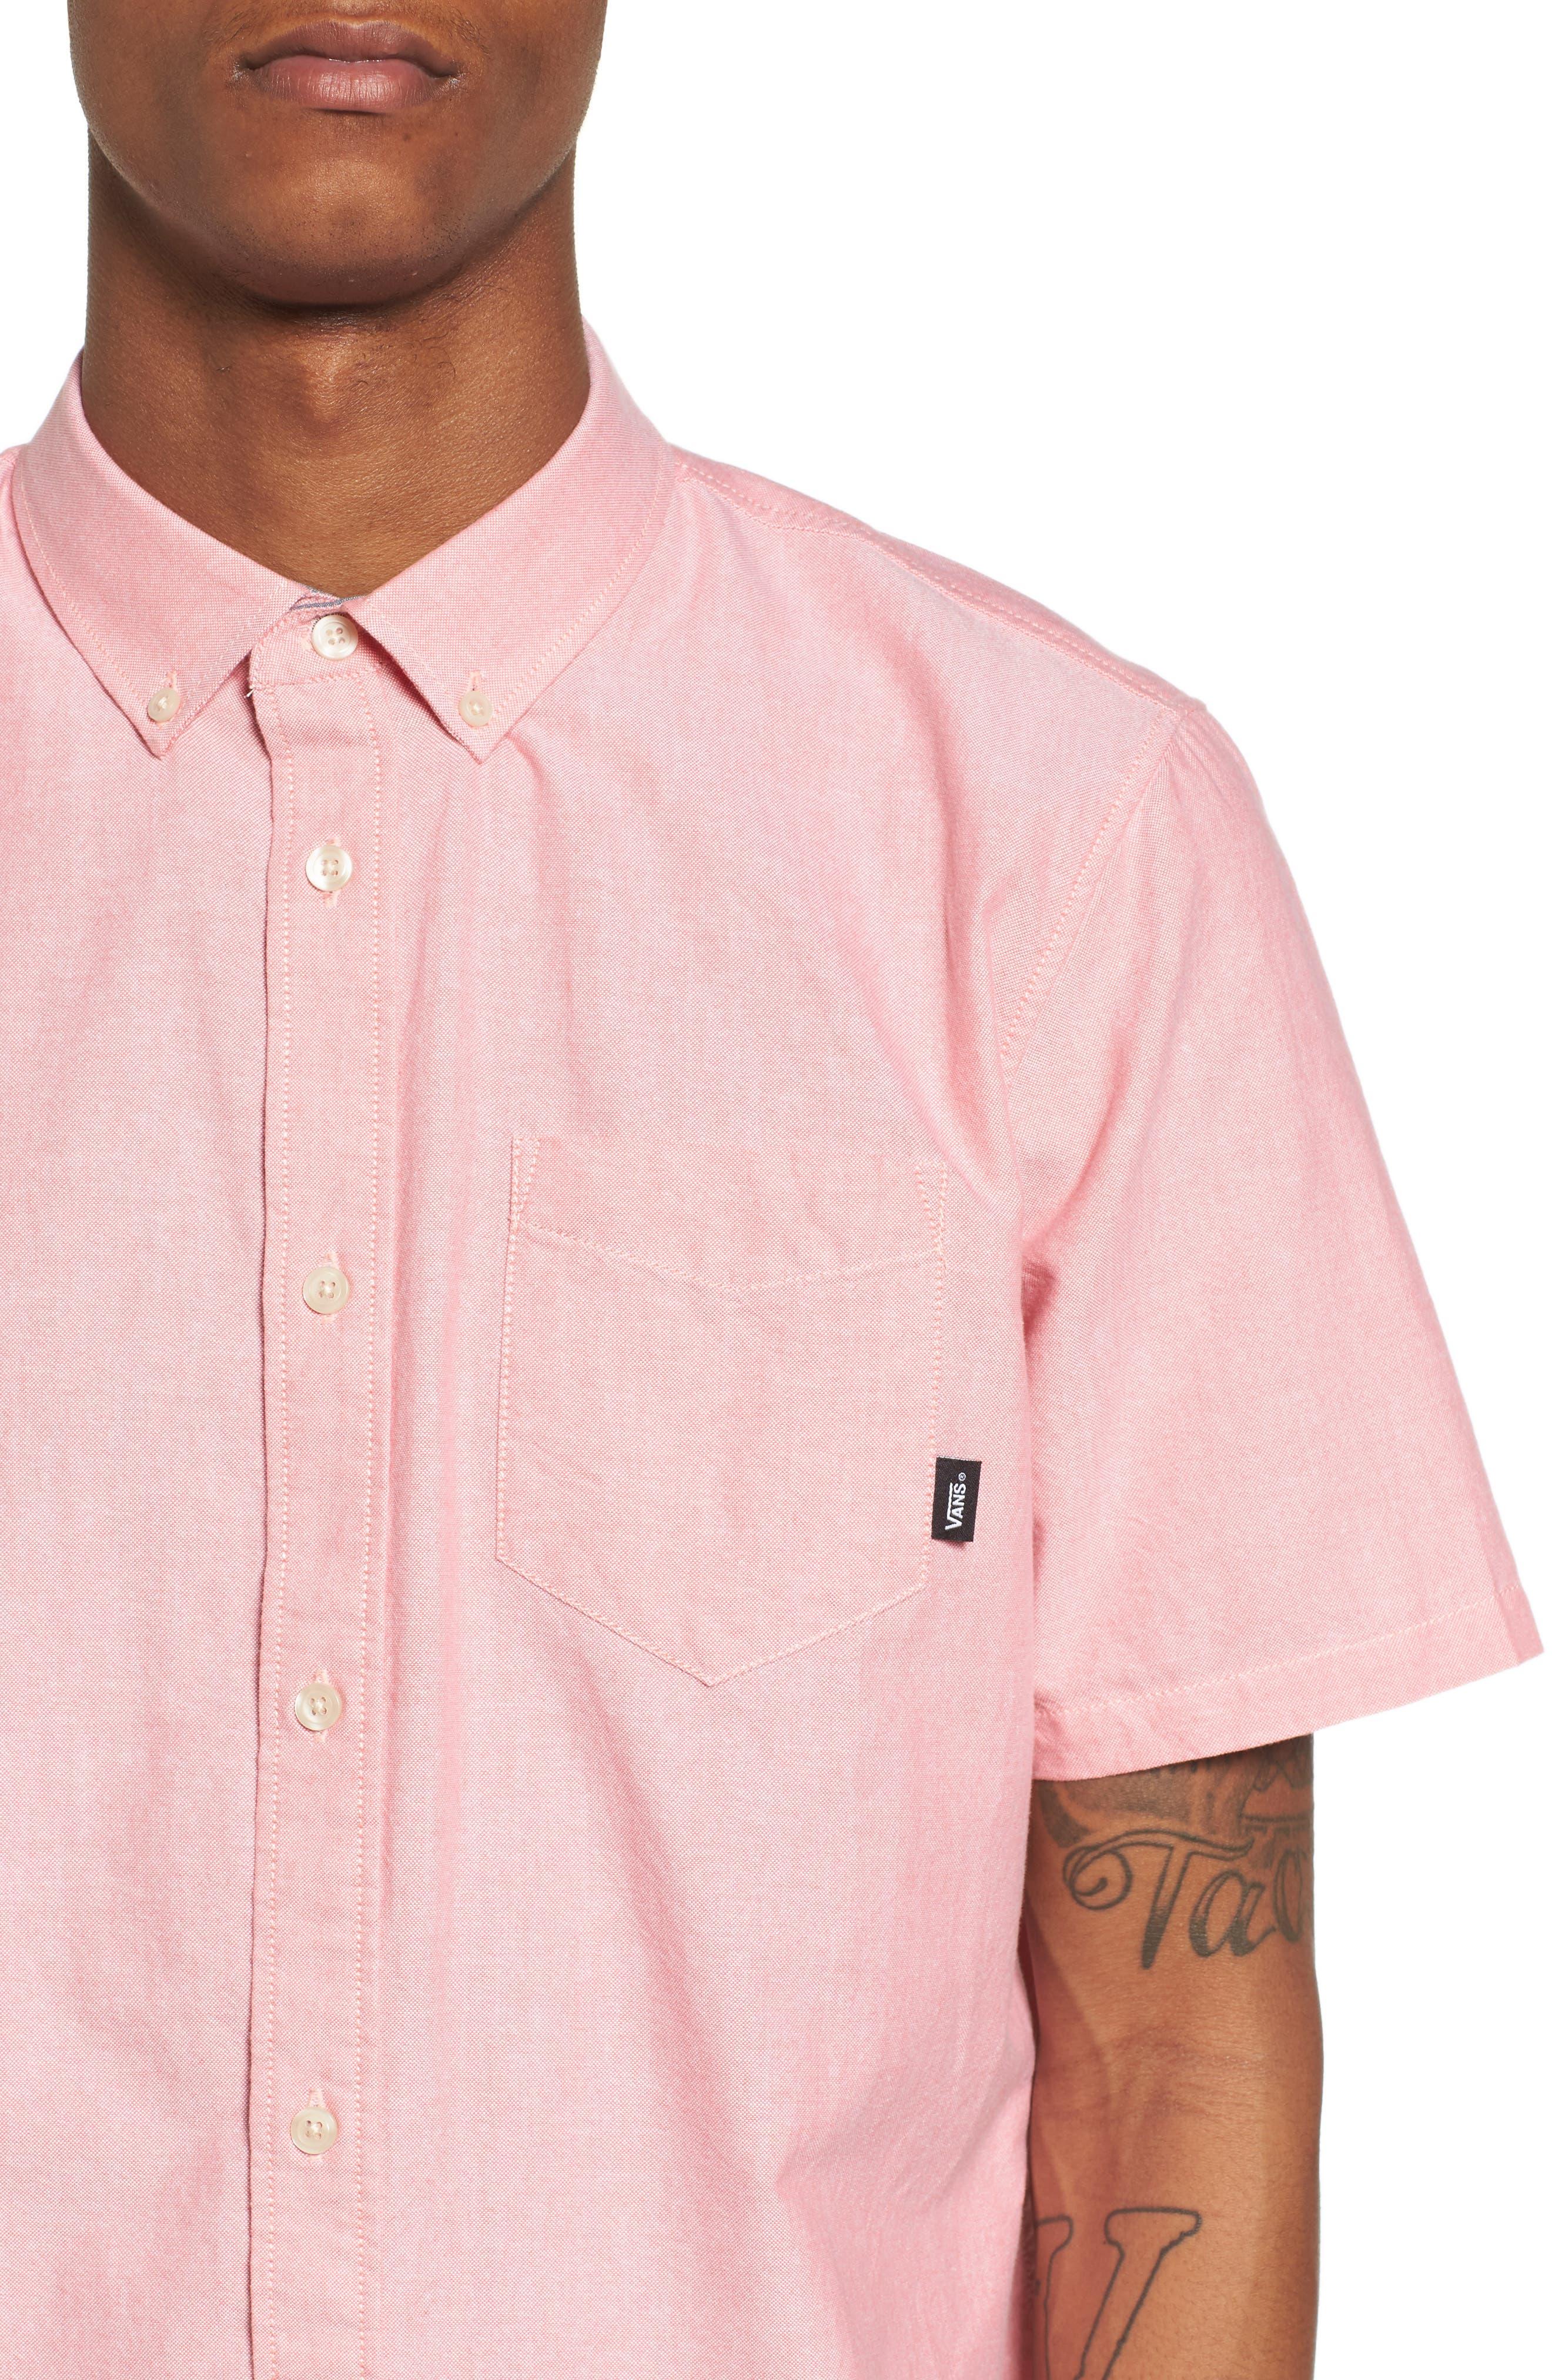 Houser Solid Woven Shirt,                             Alternate thumbnail 4, color,                             950